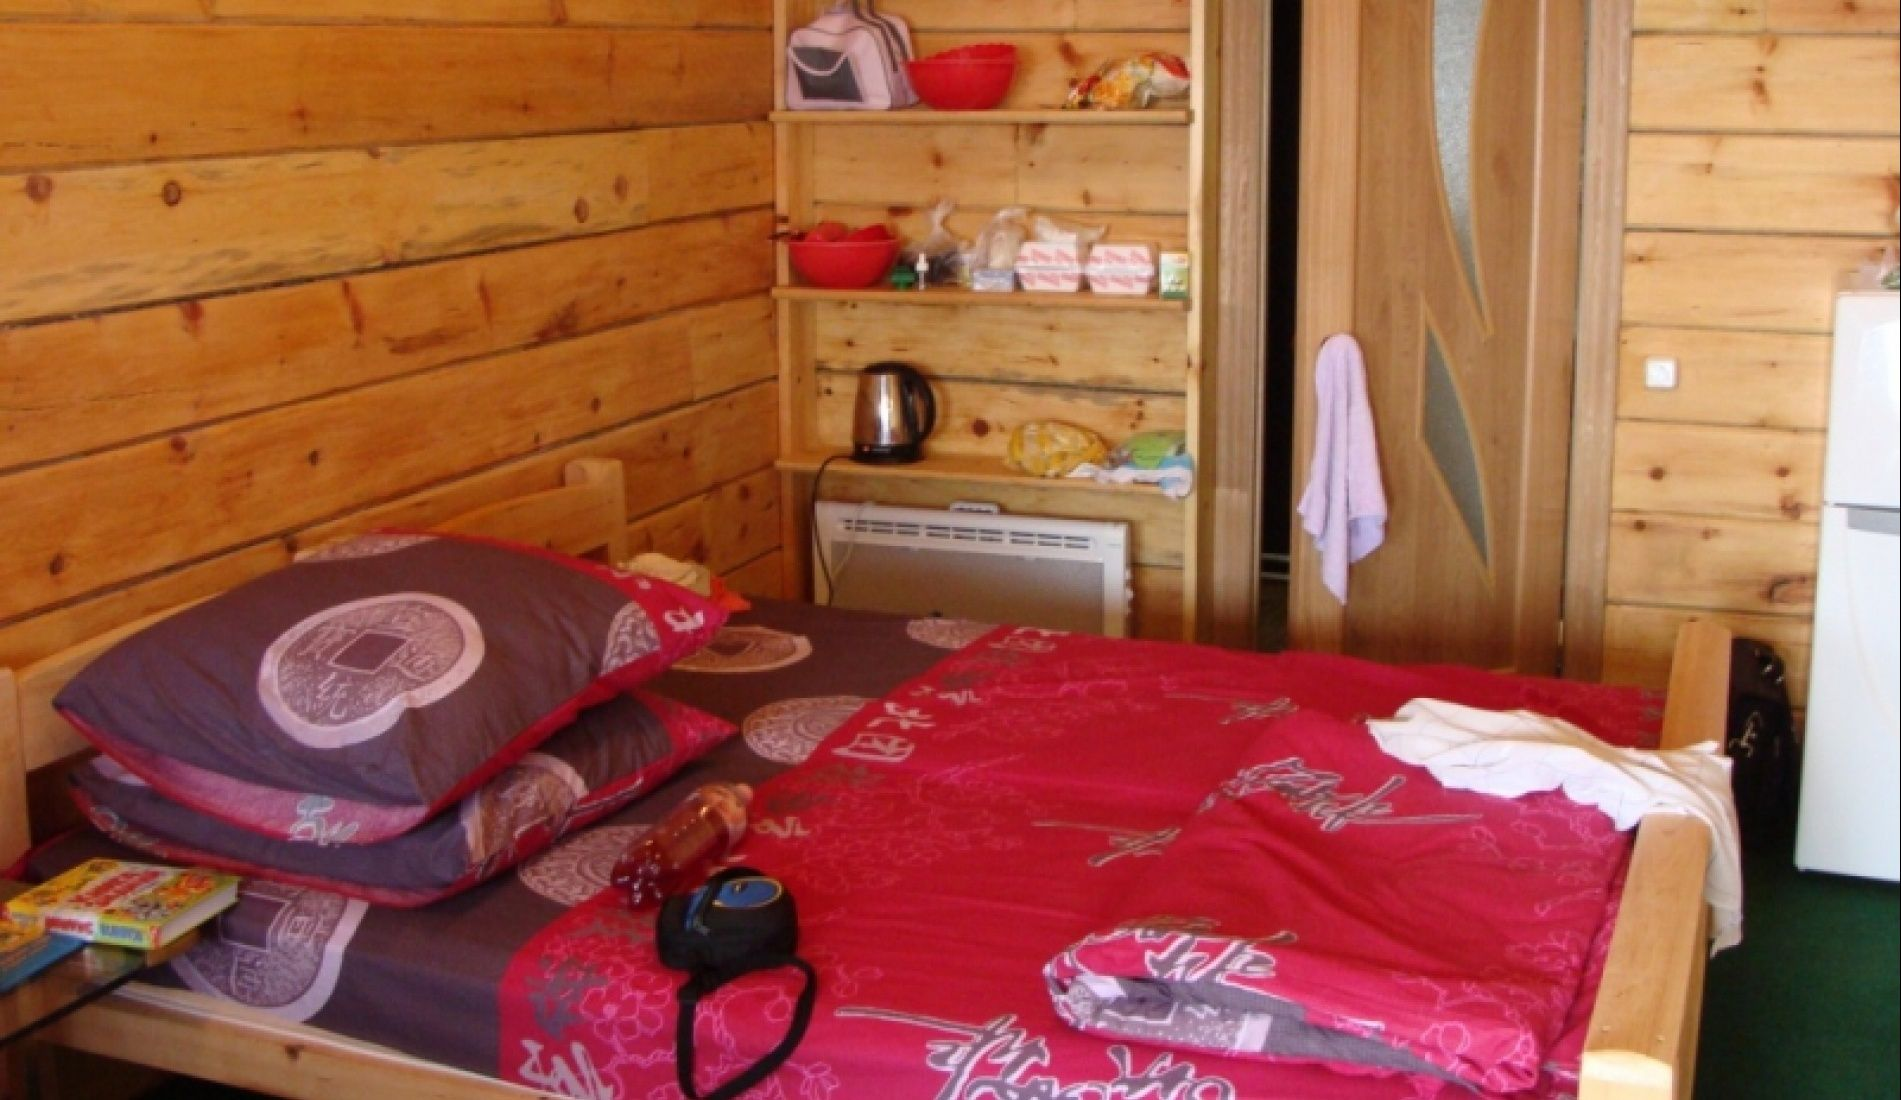 "База отдыха ""Маяк"" Приморский край 3-х местная комната в 2-х этажном доме, фото 2"